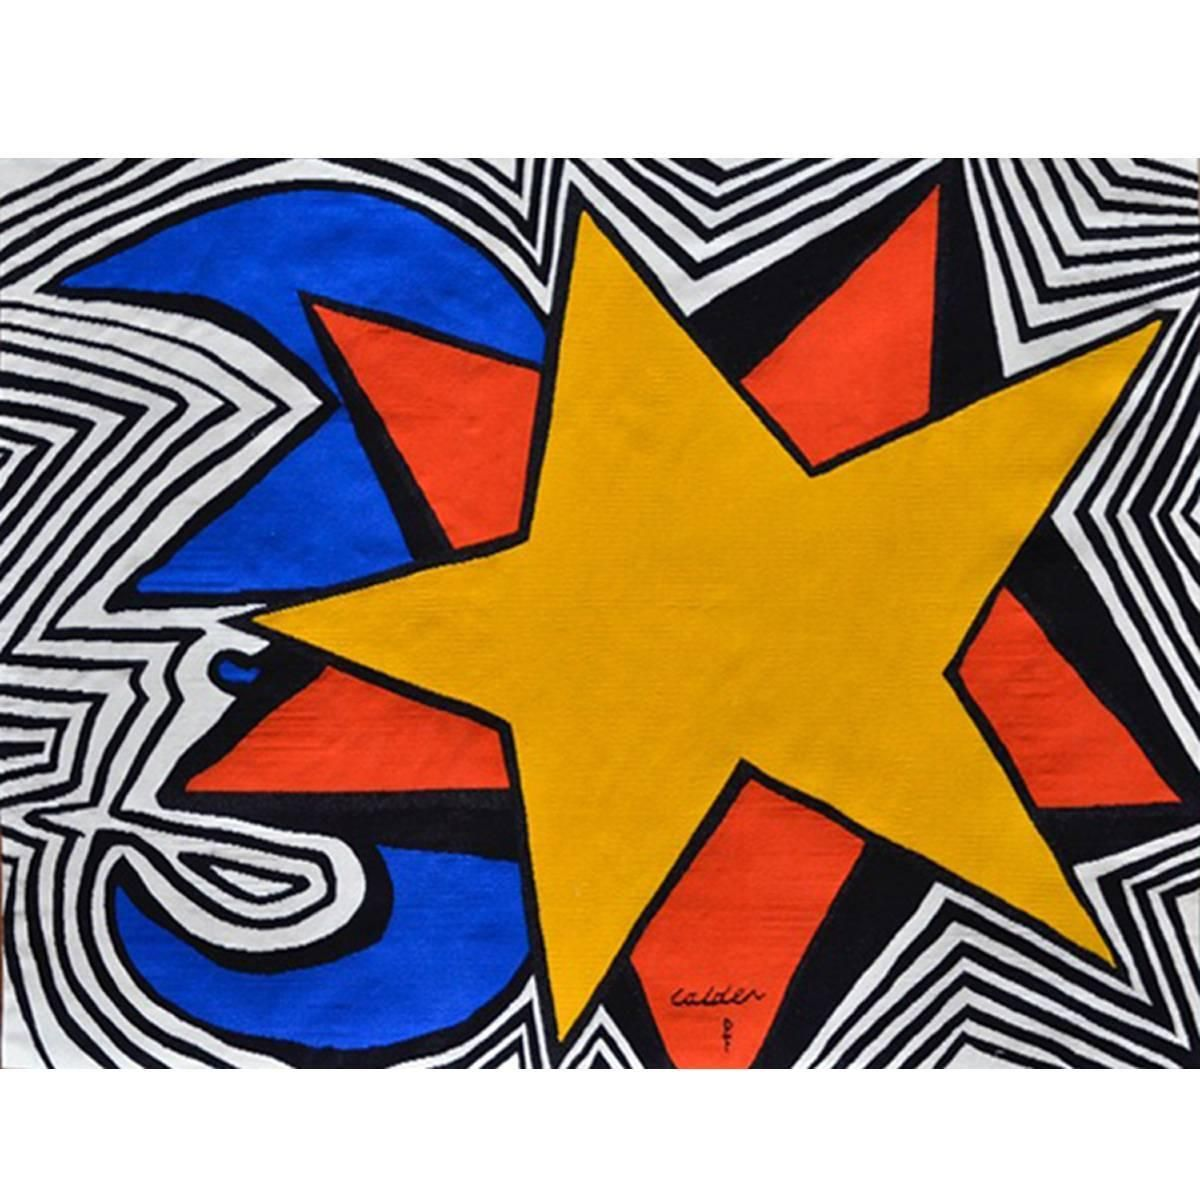 Alexander Calder Star Wool Tapestry Ca 1975 Alexander Calder